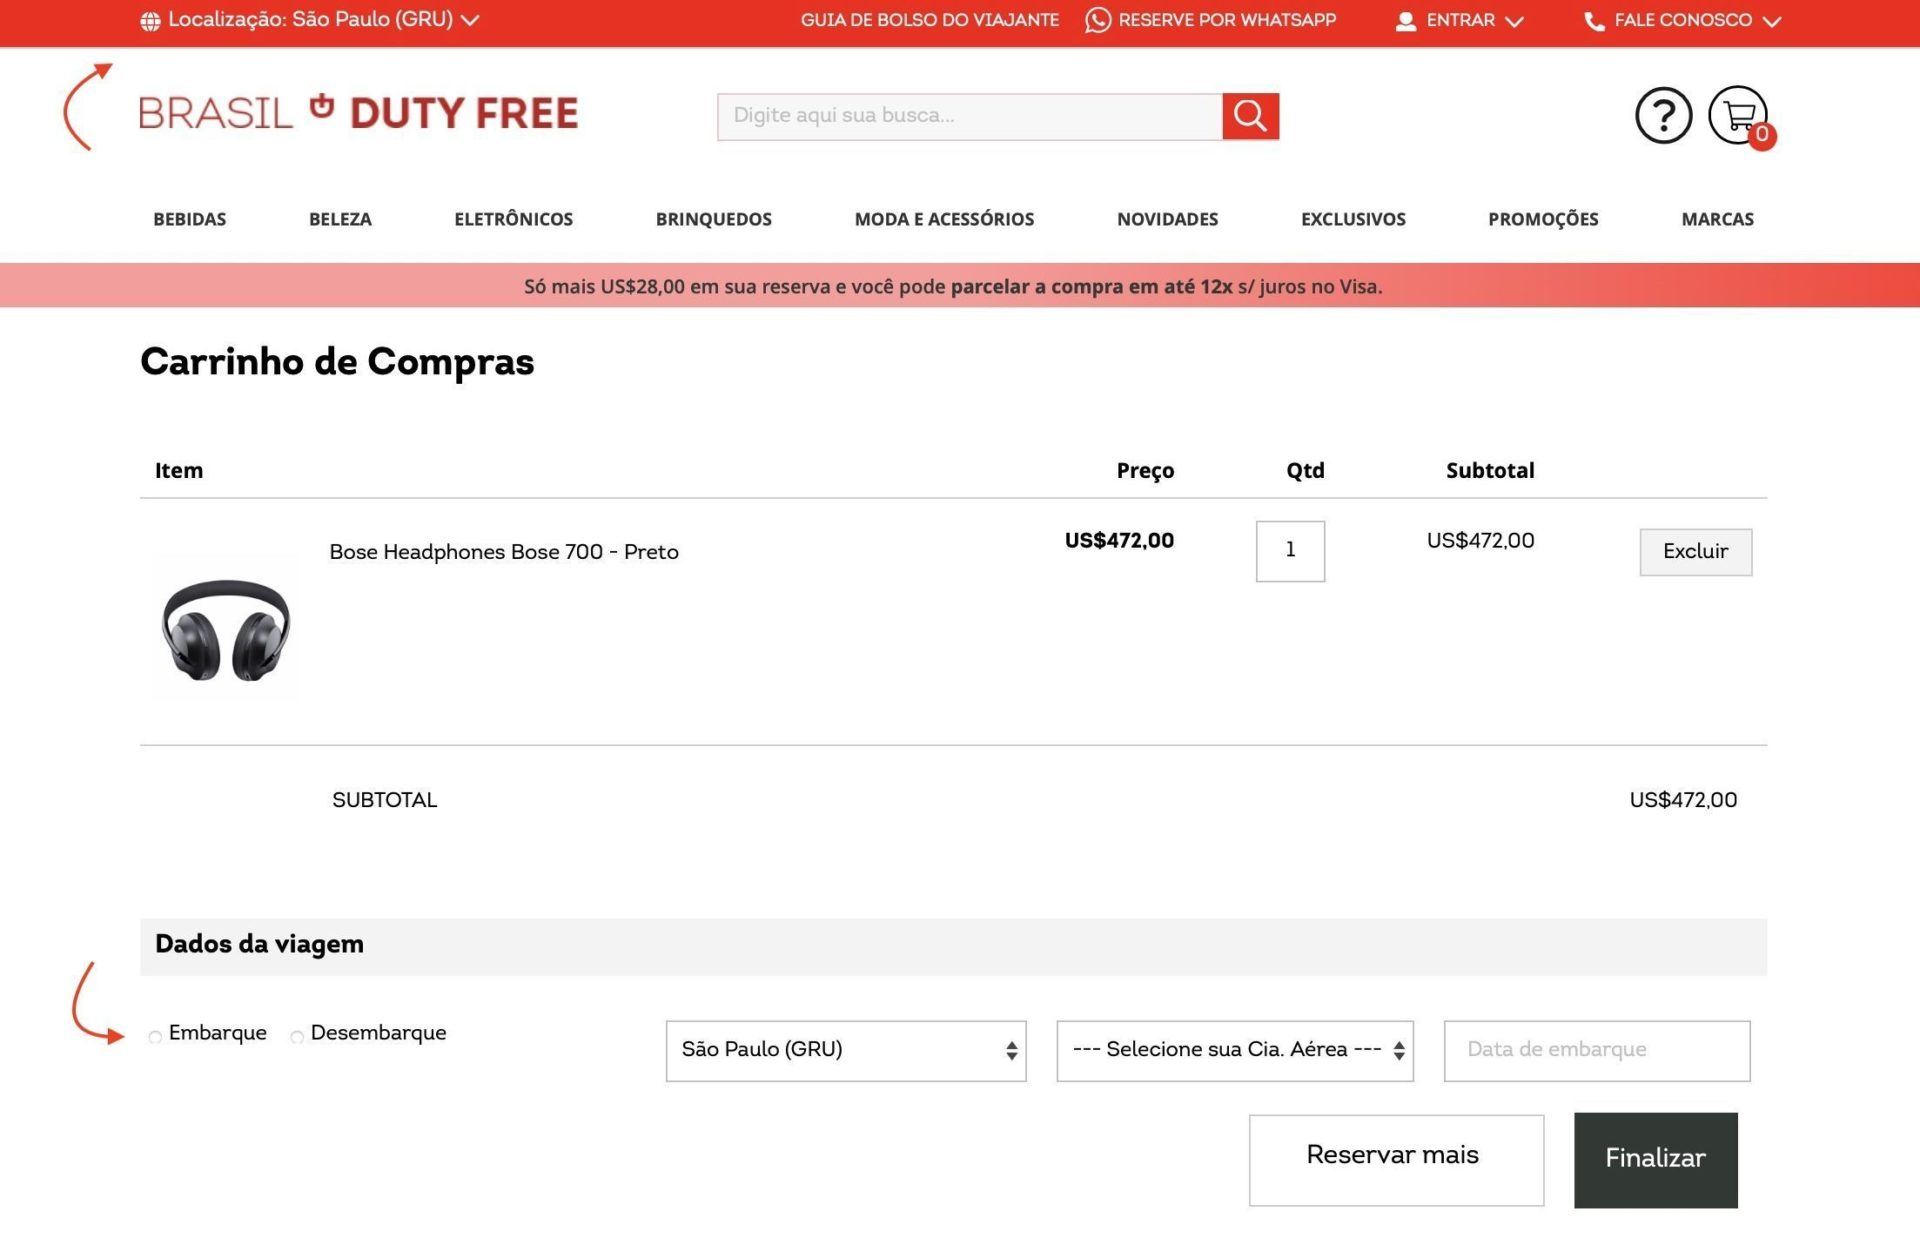 Duty Free retirar produtos